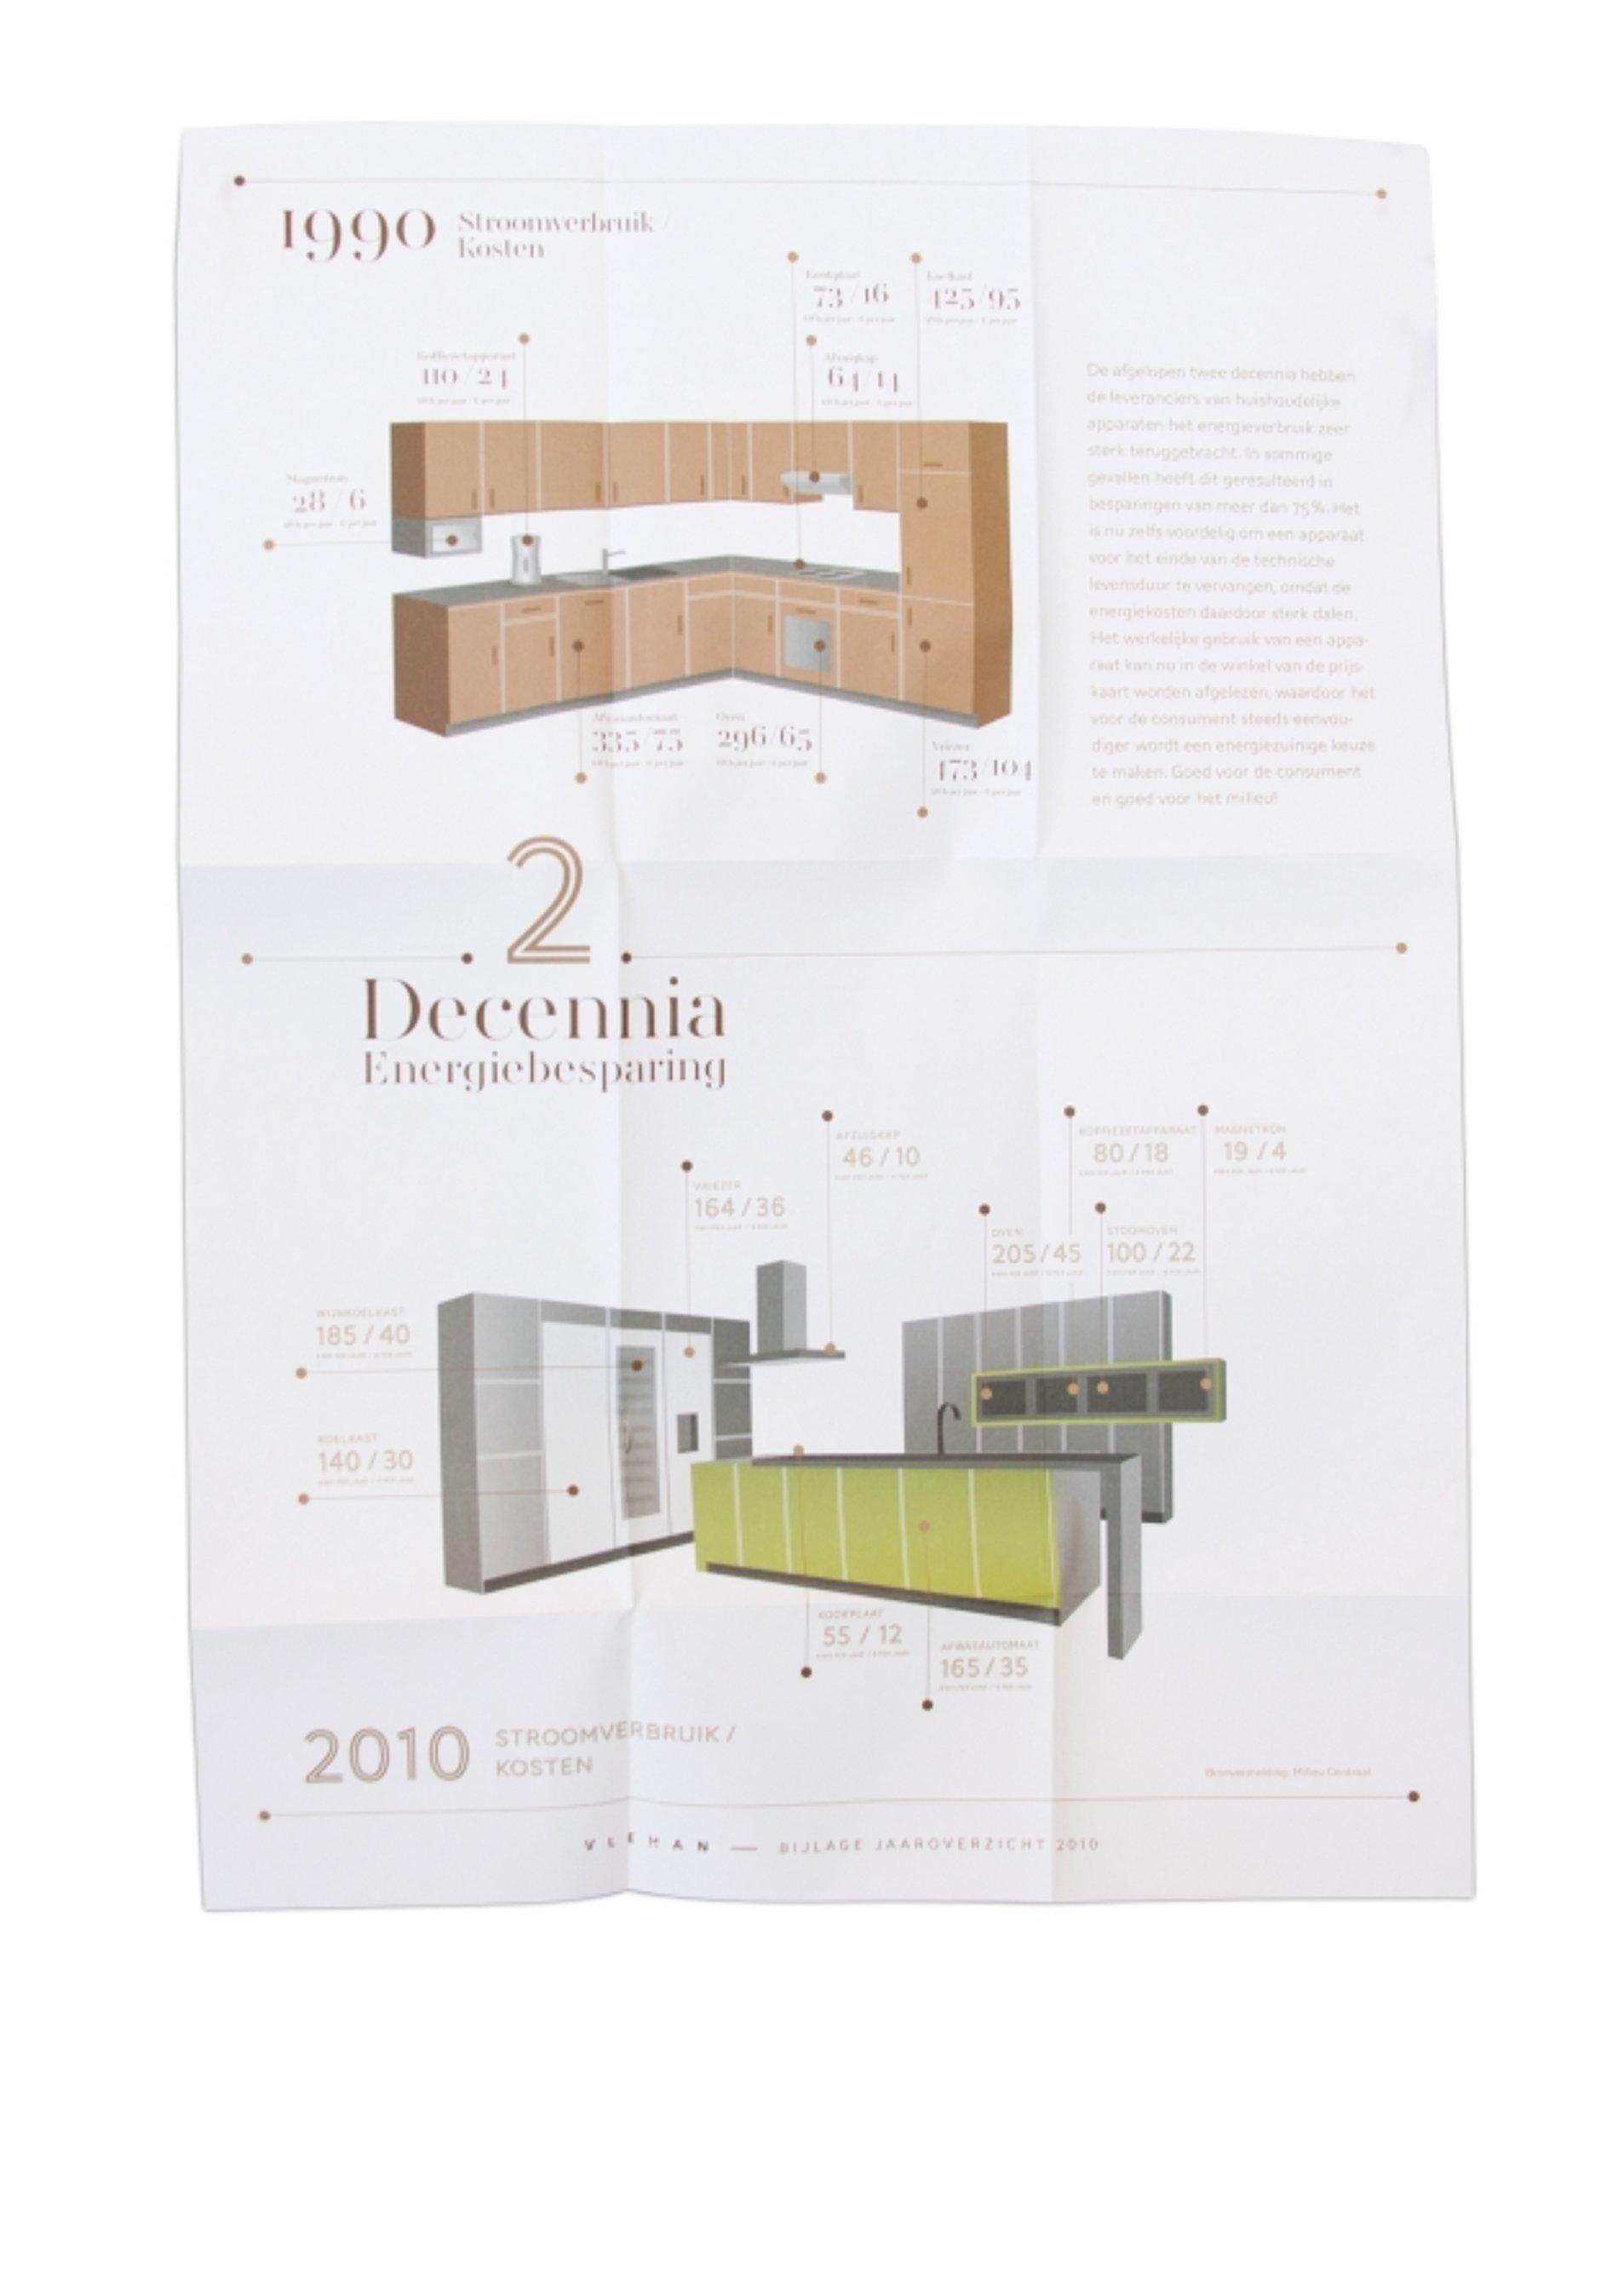 Two decades energy saving | Red Dot Design Award